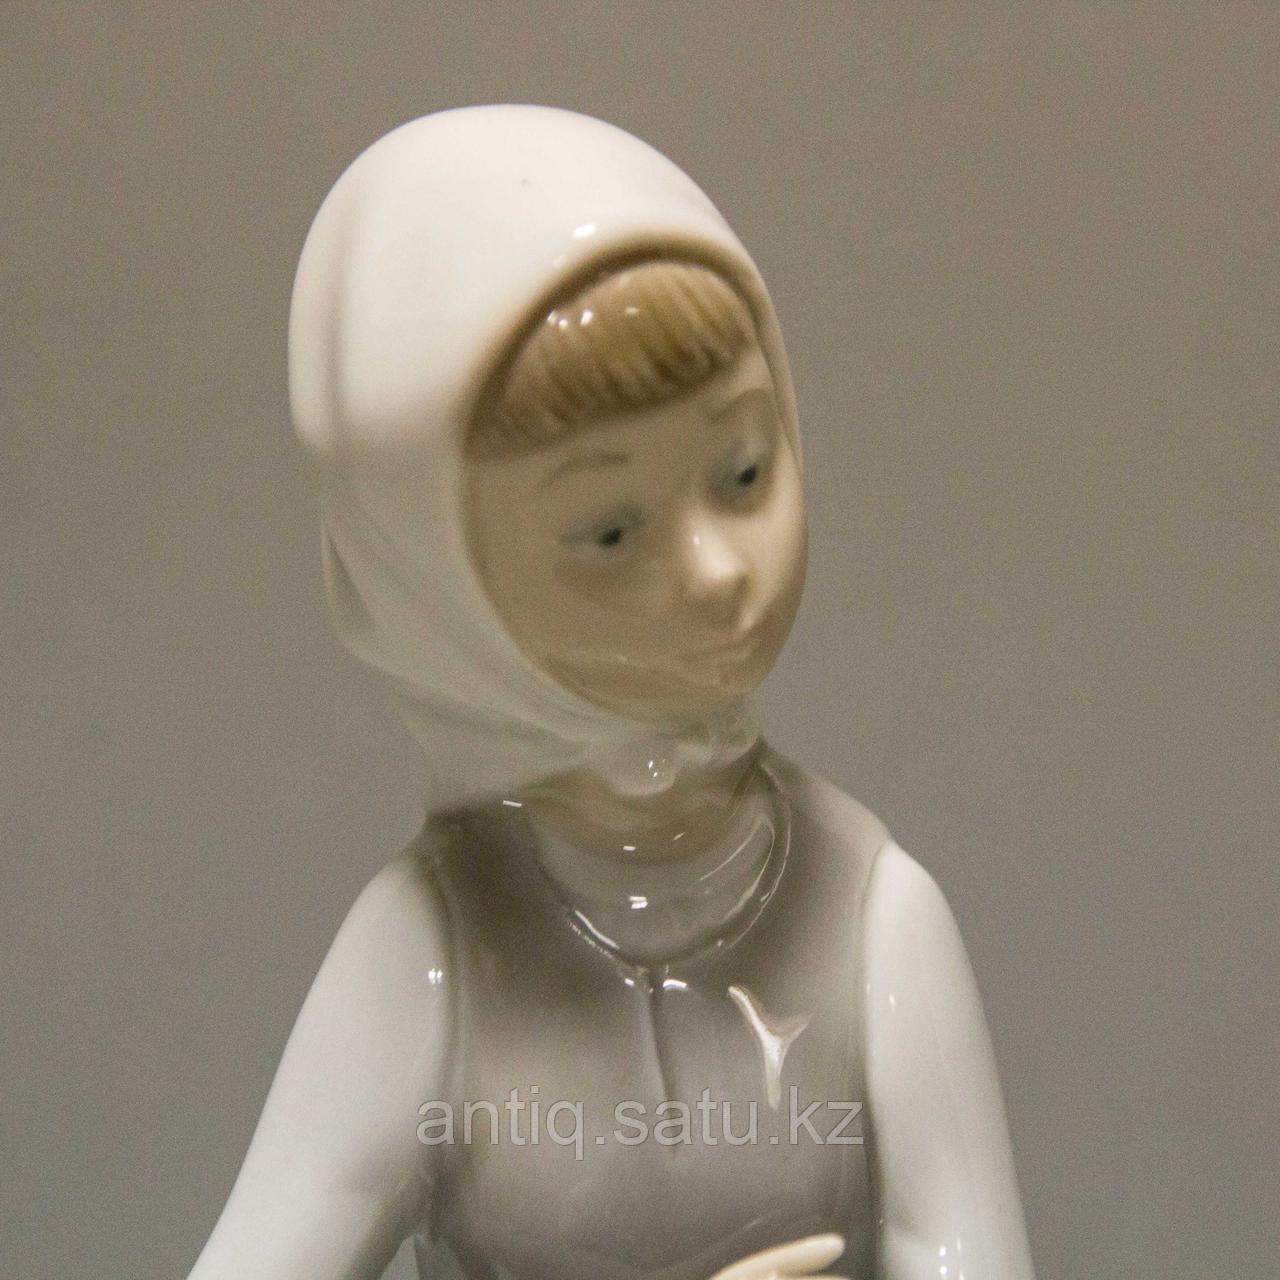 Девочка с ягненком. Фарфоровая мануфактура Lladro - фото 4